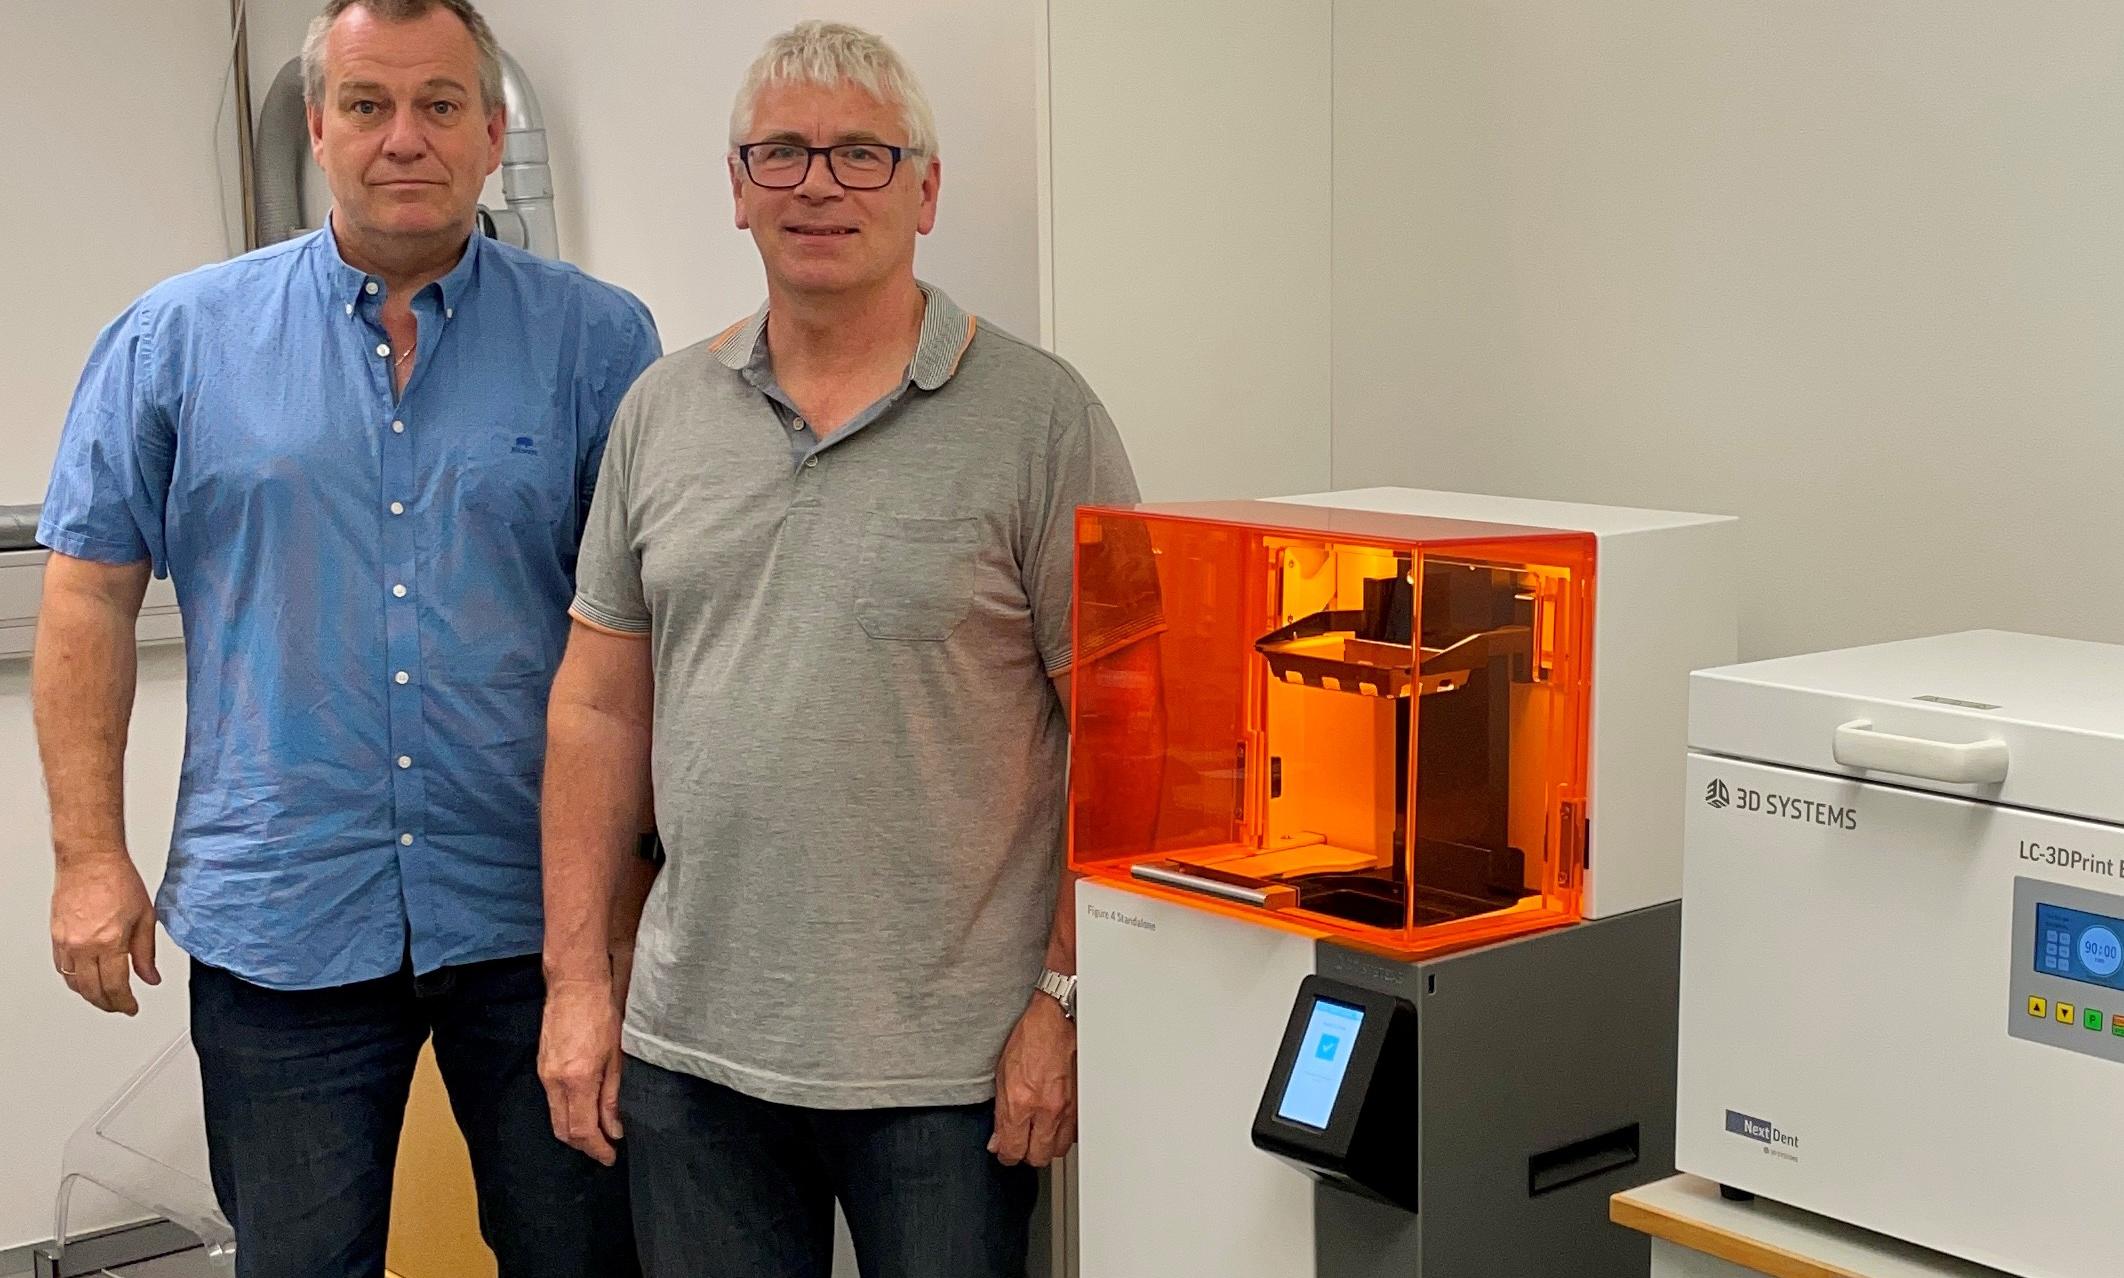 Tonny Socha Refshammer and Henry Frederiksen, tooling designers, at Widex.